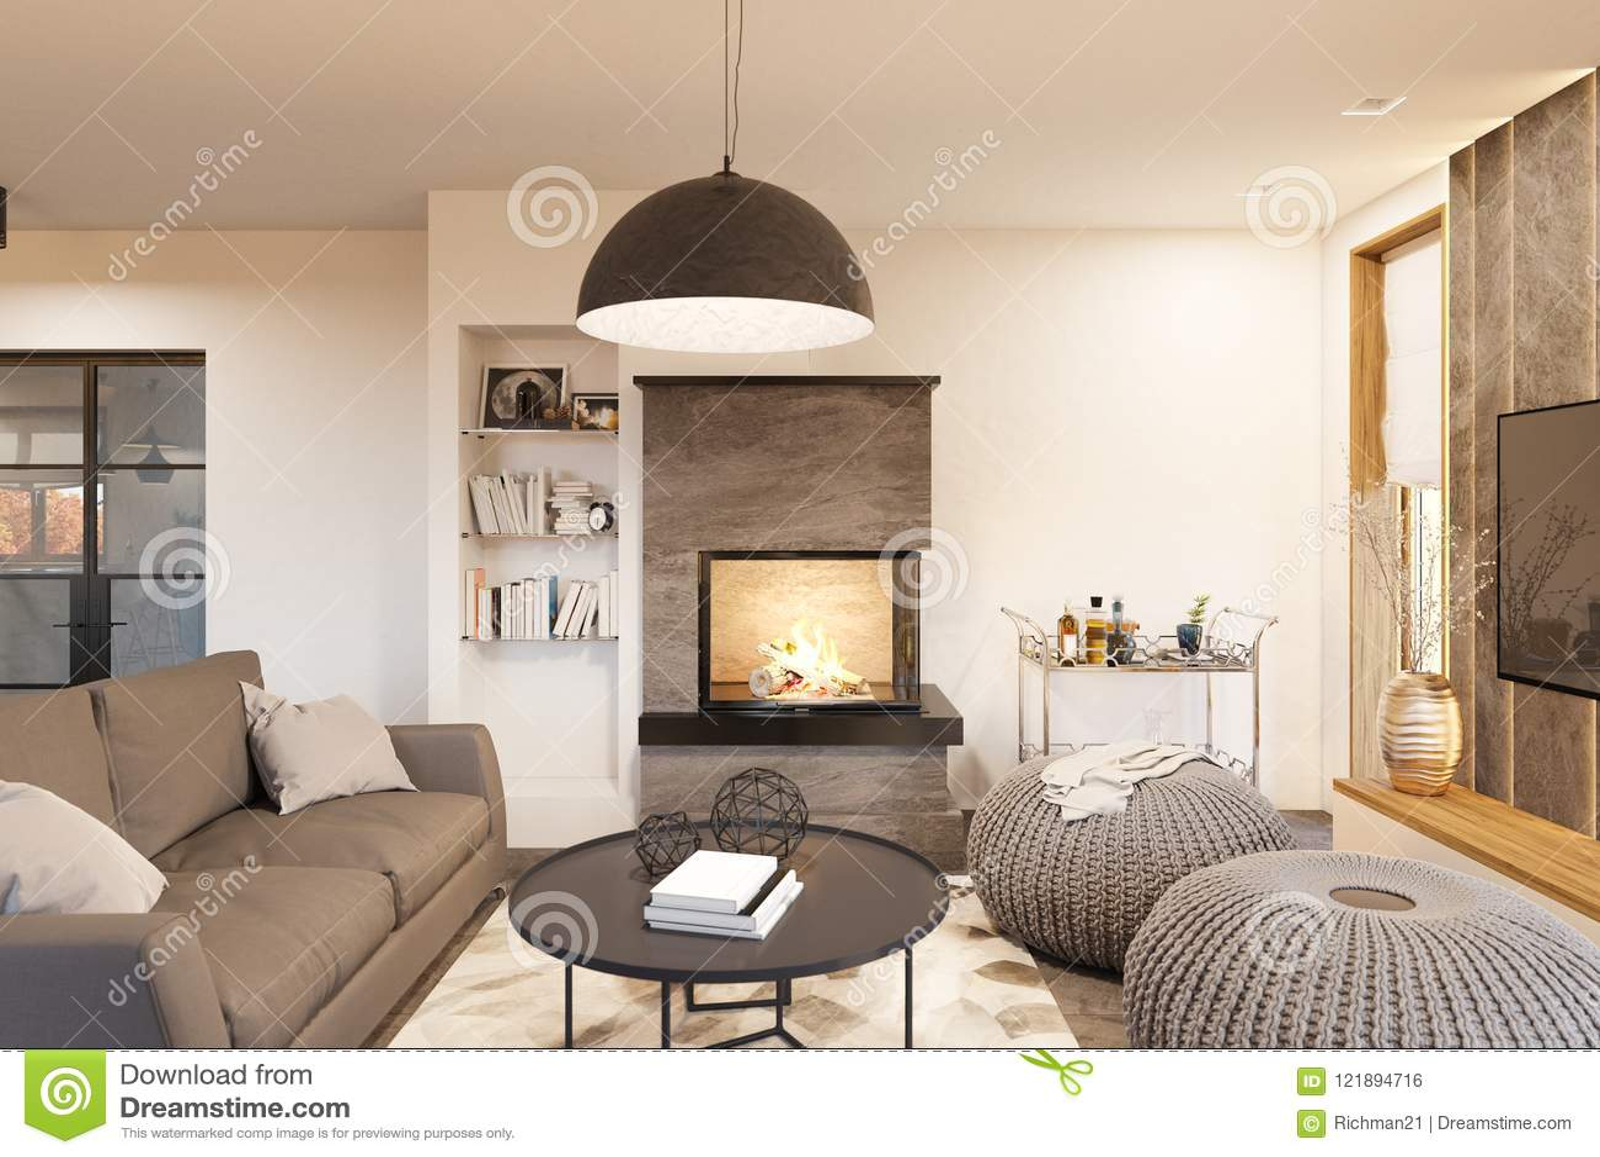 Generation Z Interior Design Modern House - Modern House